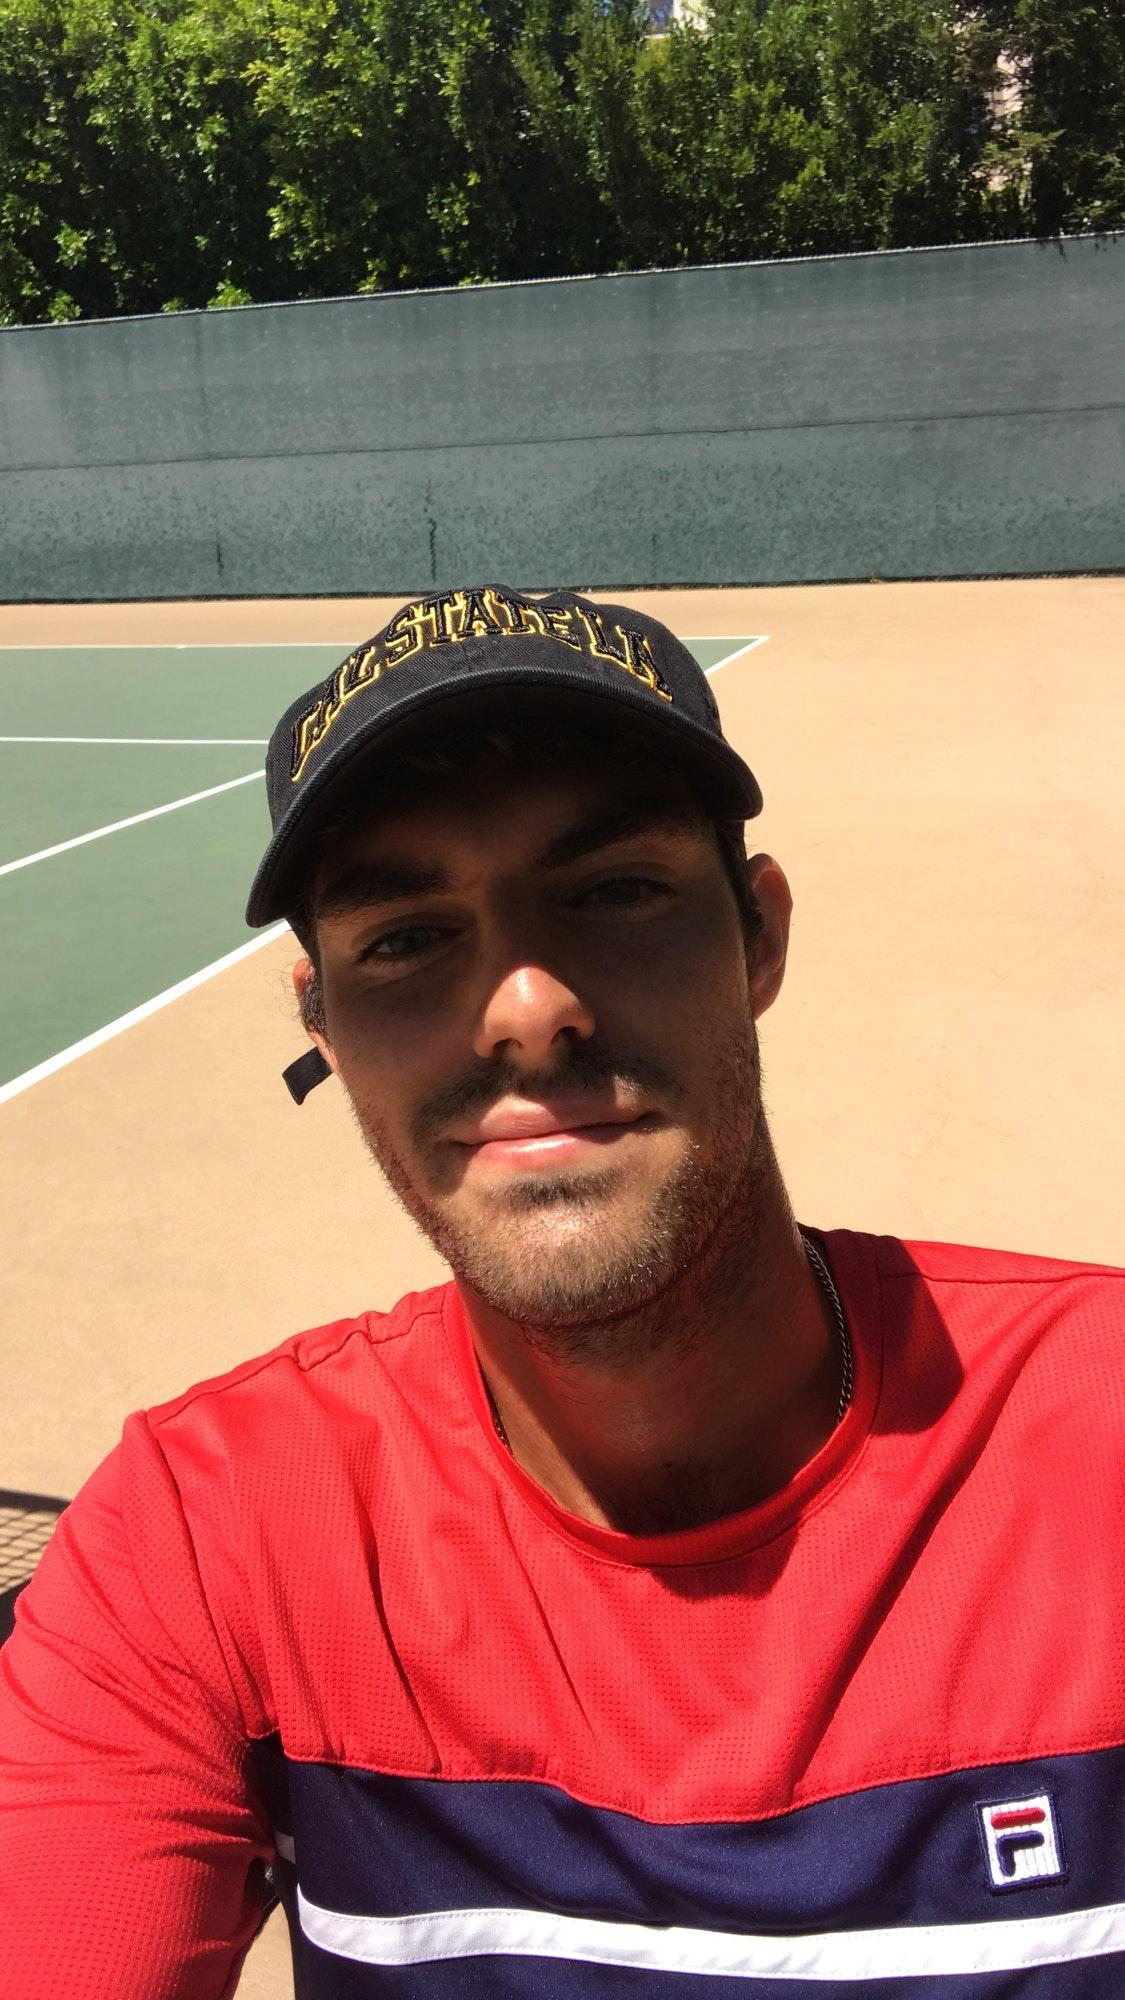 Nicholas S. teaches tennis lessons in Glendale, CA